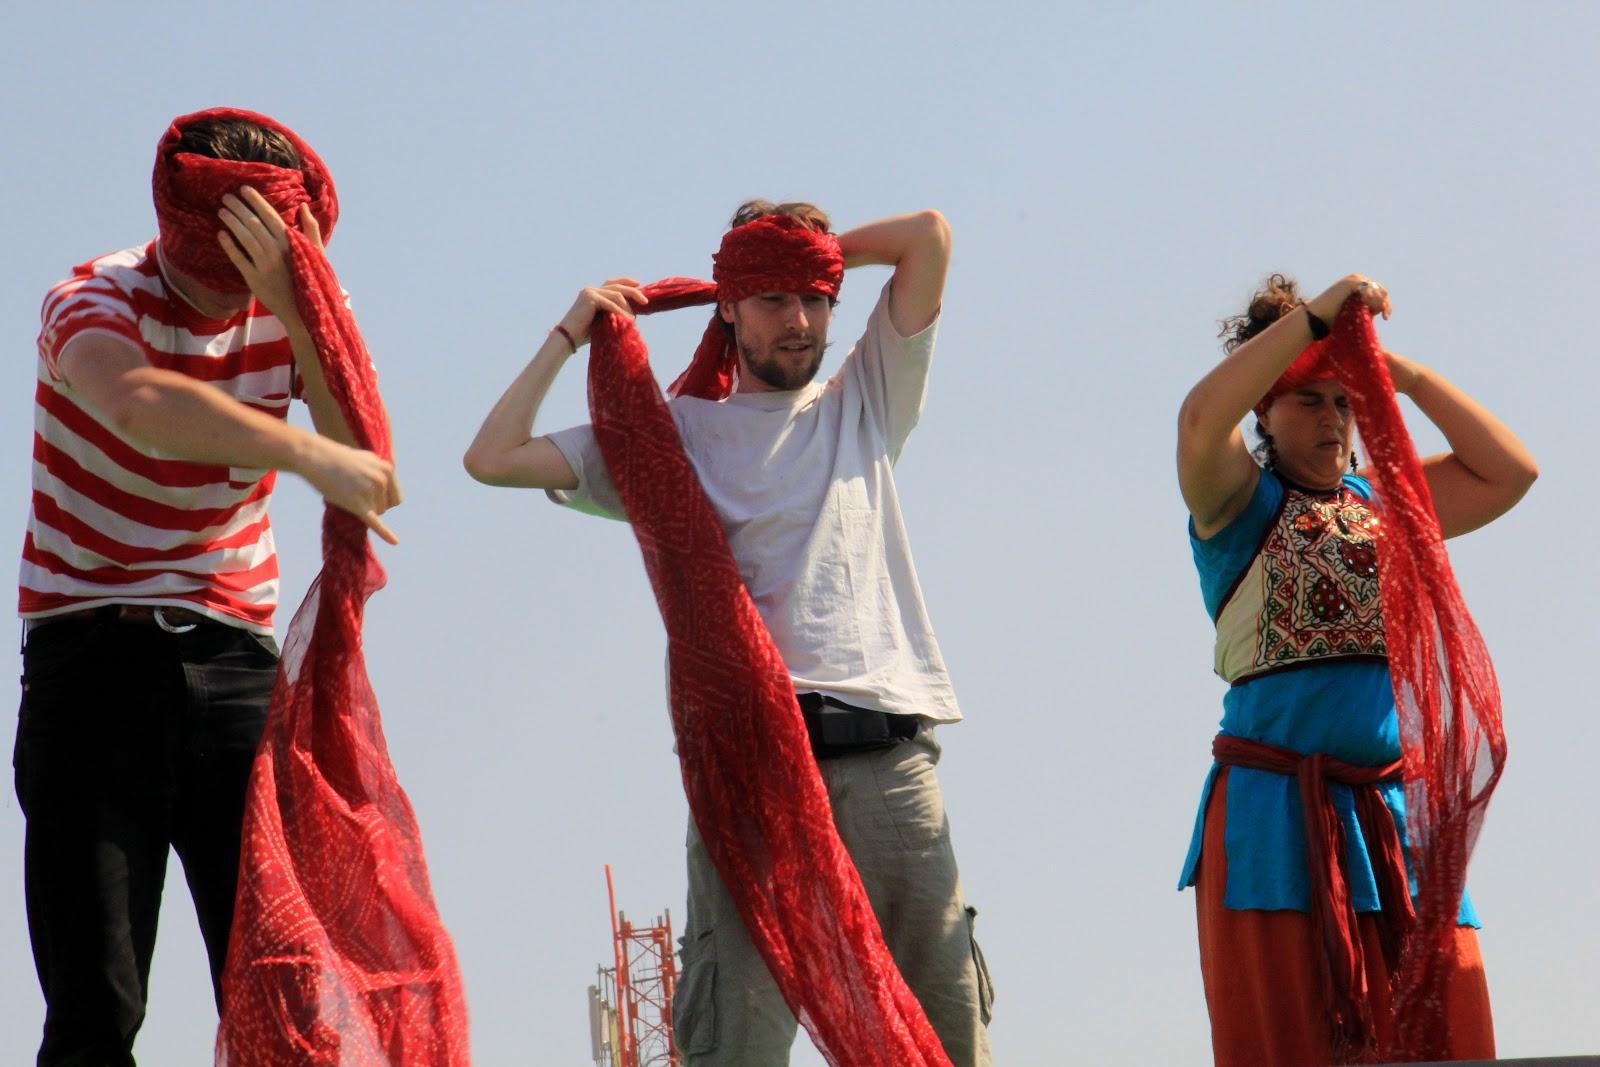 Turban Tying